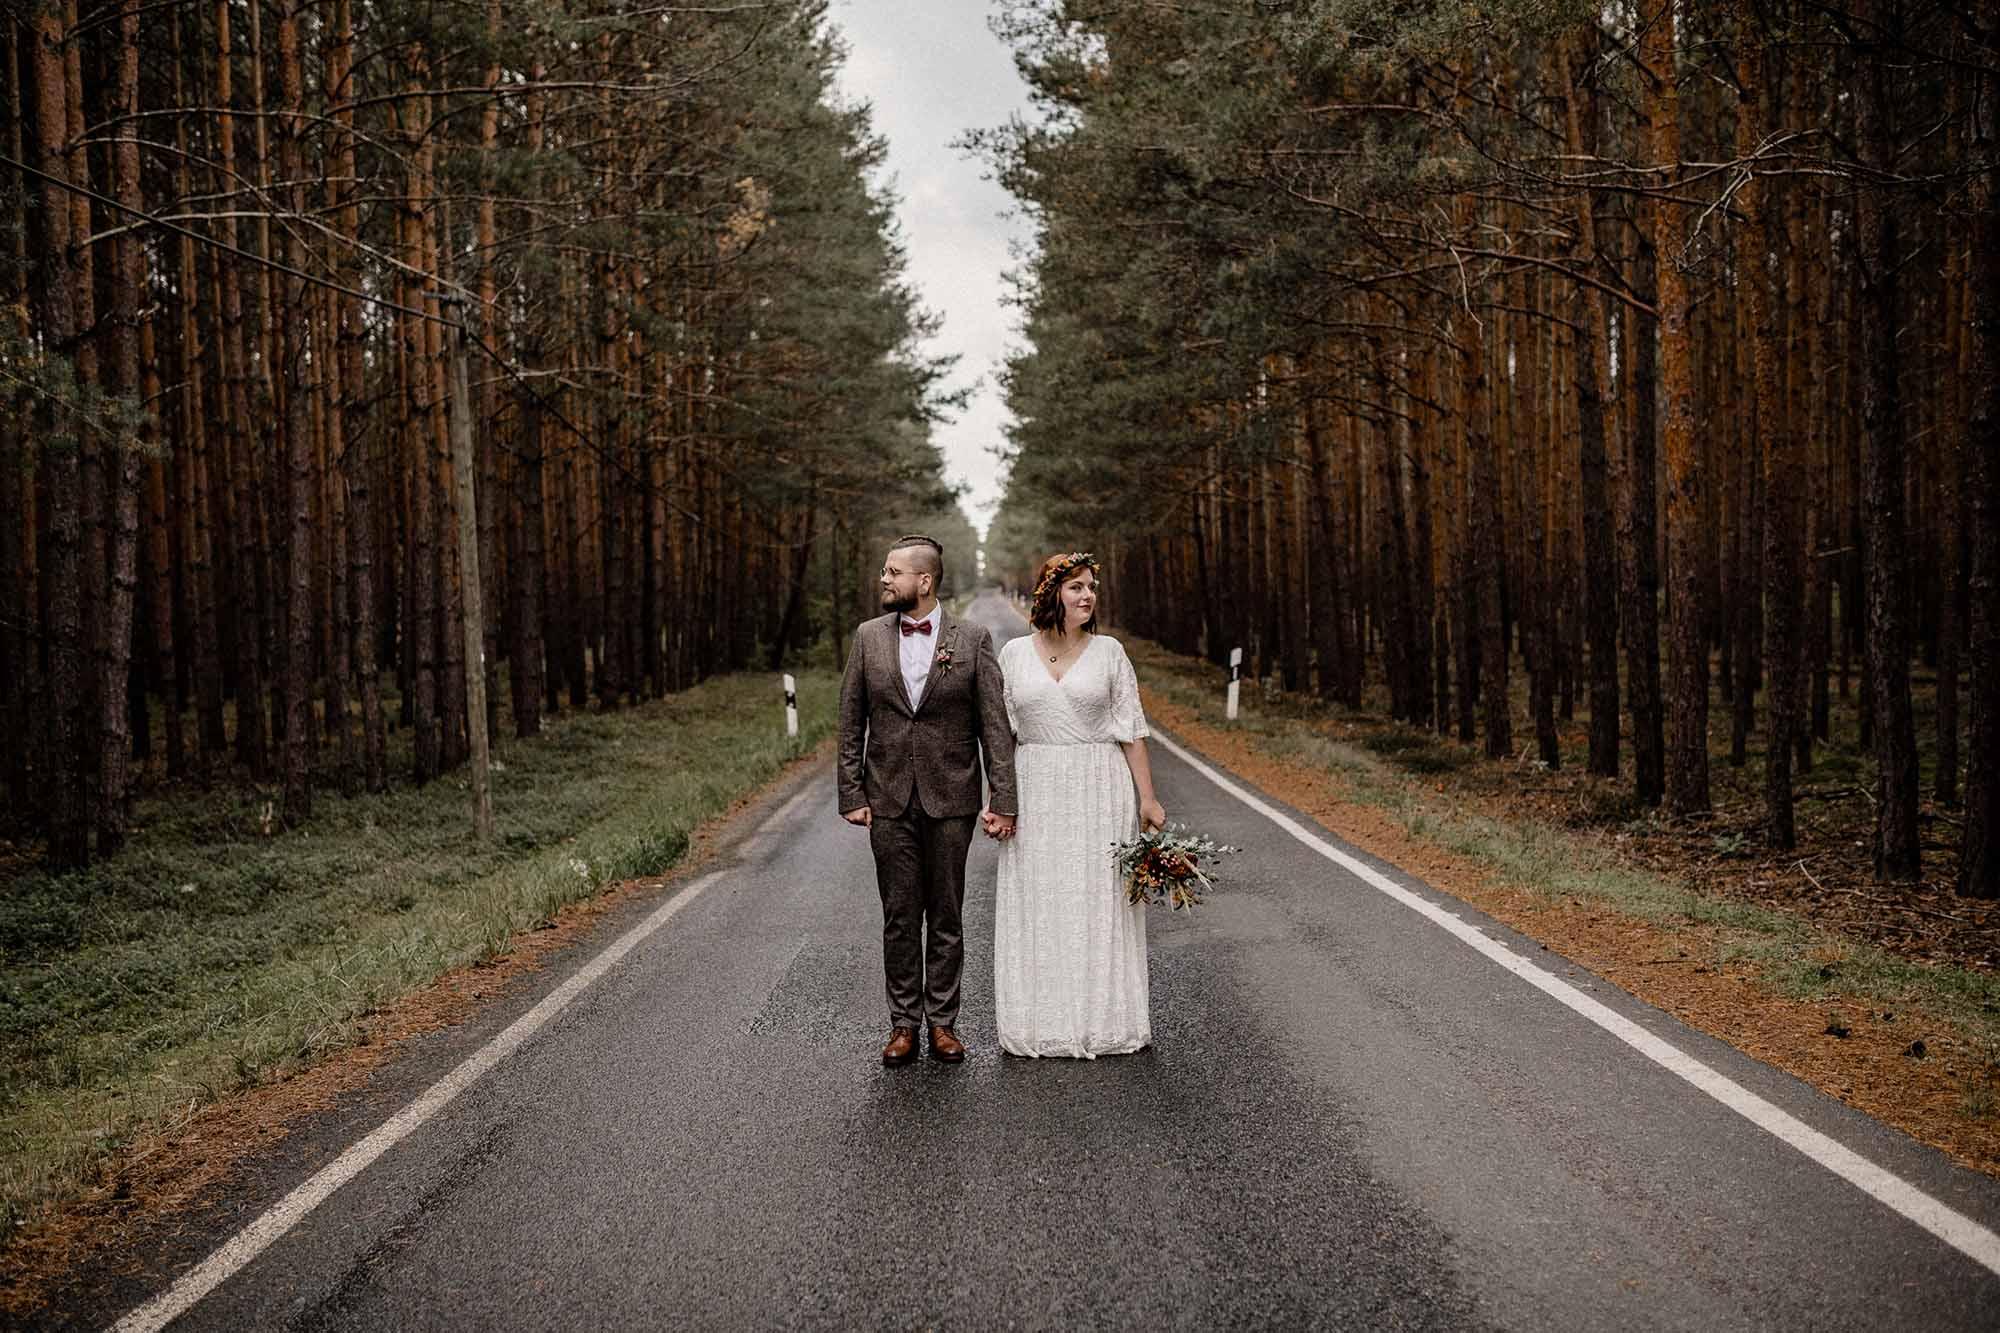 Virginia-Pech-Fotografie-Hochzeitsfotografie-Hochzeitsfotograf-Brandenburg-Spreewald-Spreewood-PC-40